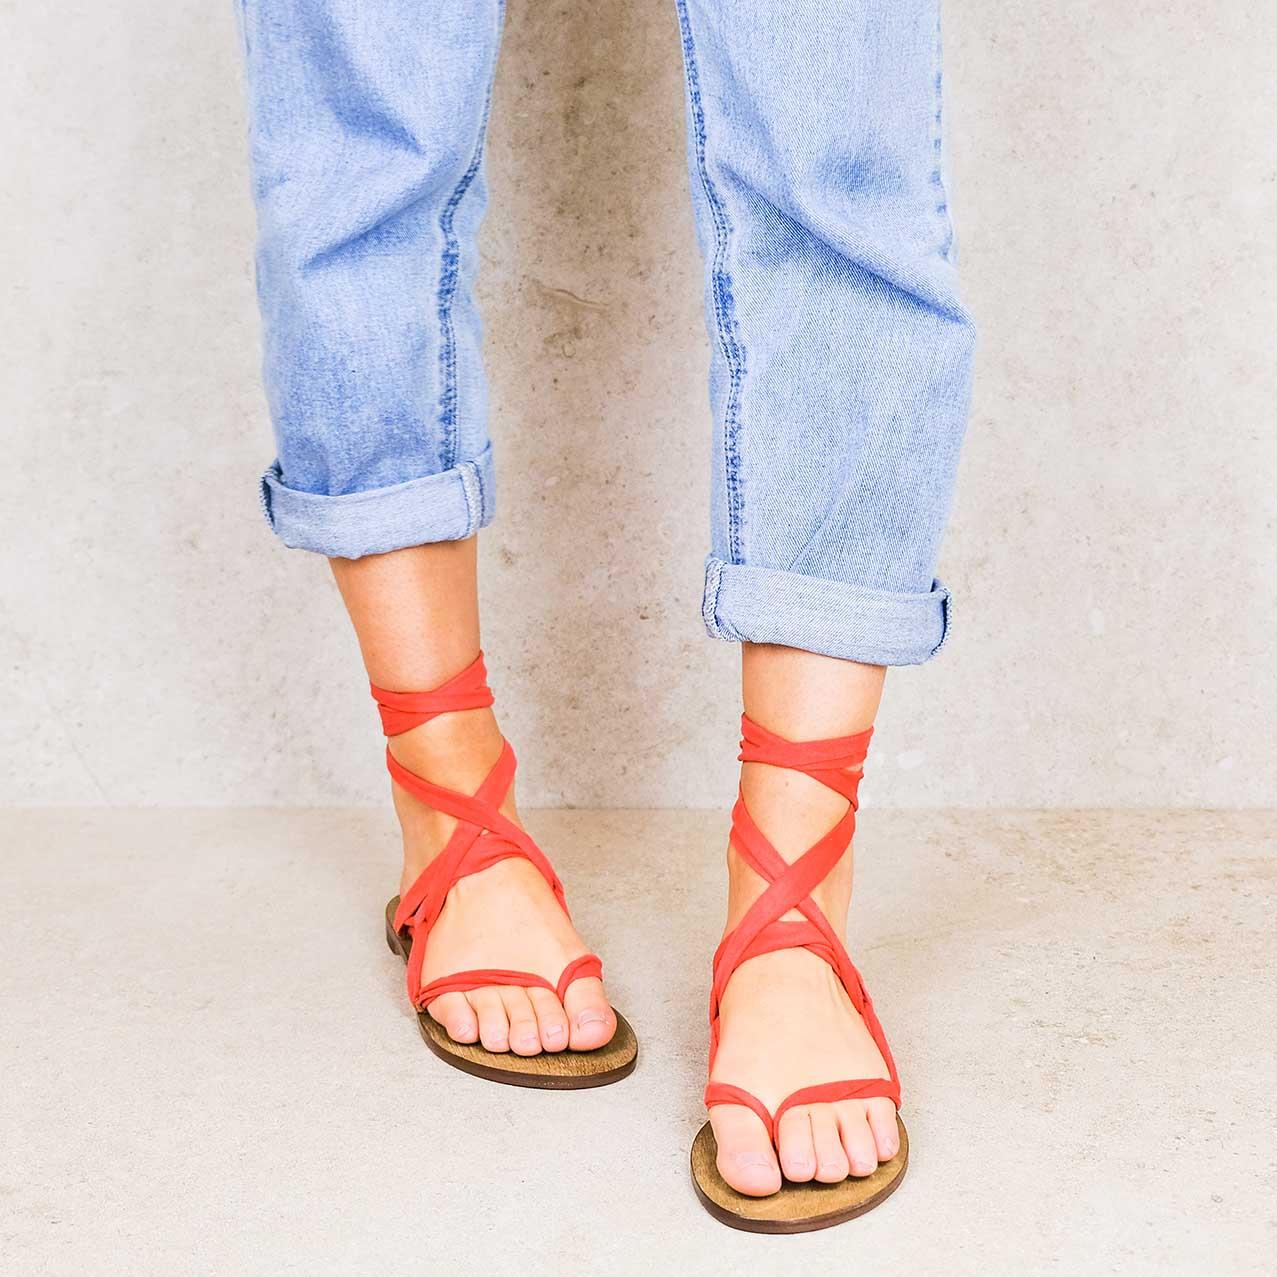 Devils-red_suede ribbons linten lintsandalen sandals travelsandals vegan sustainable sandals wikkelsandalen